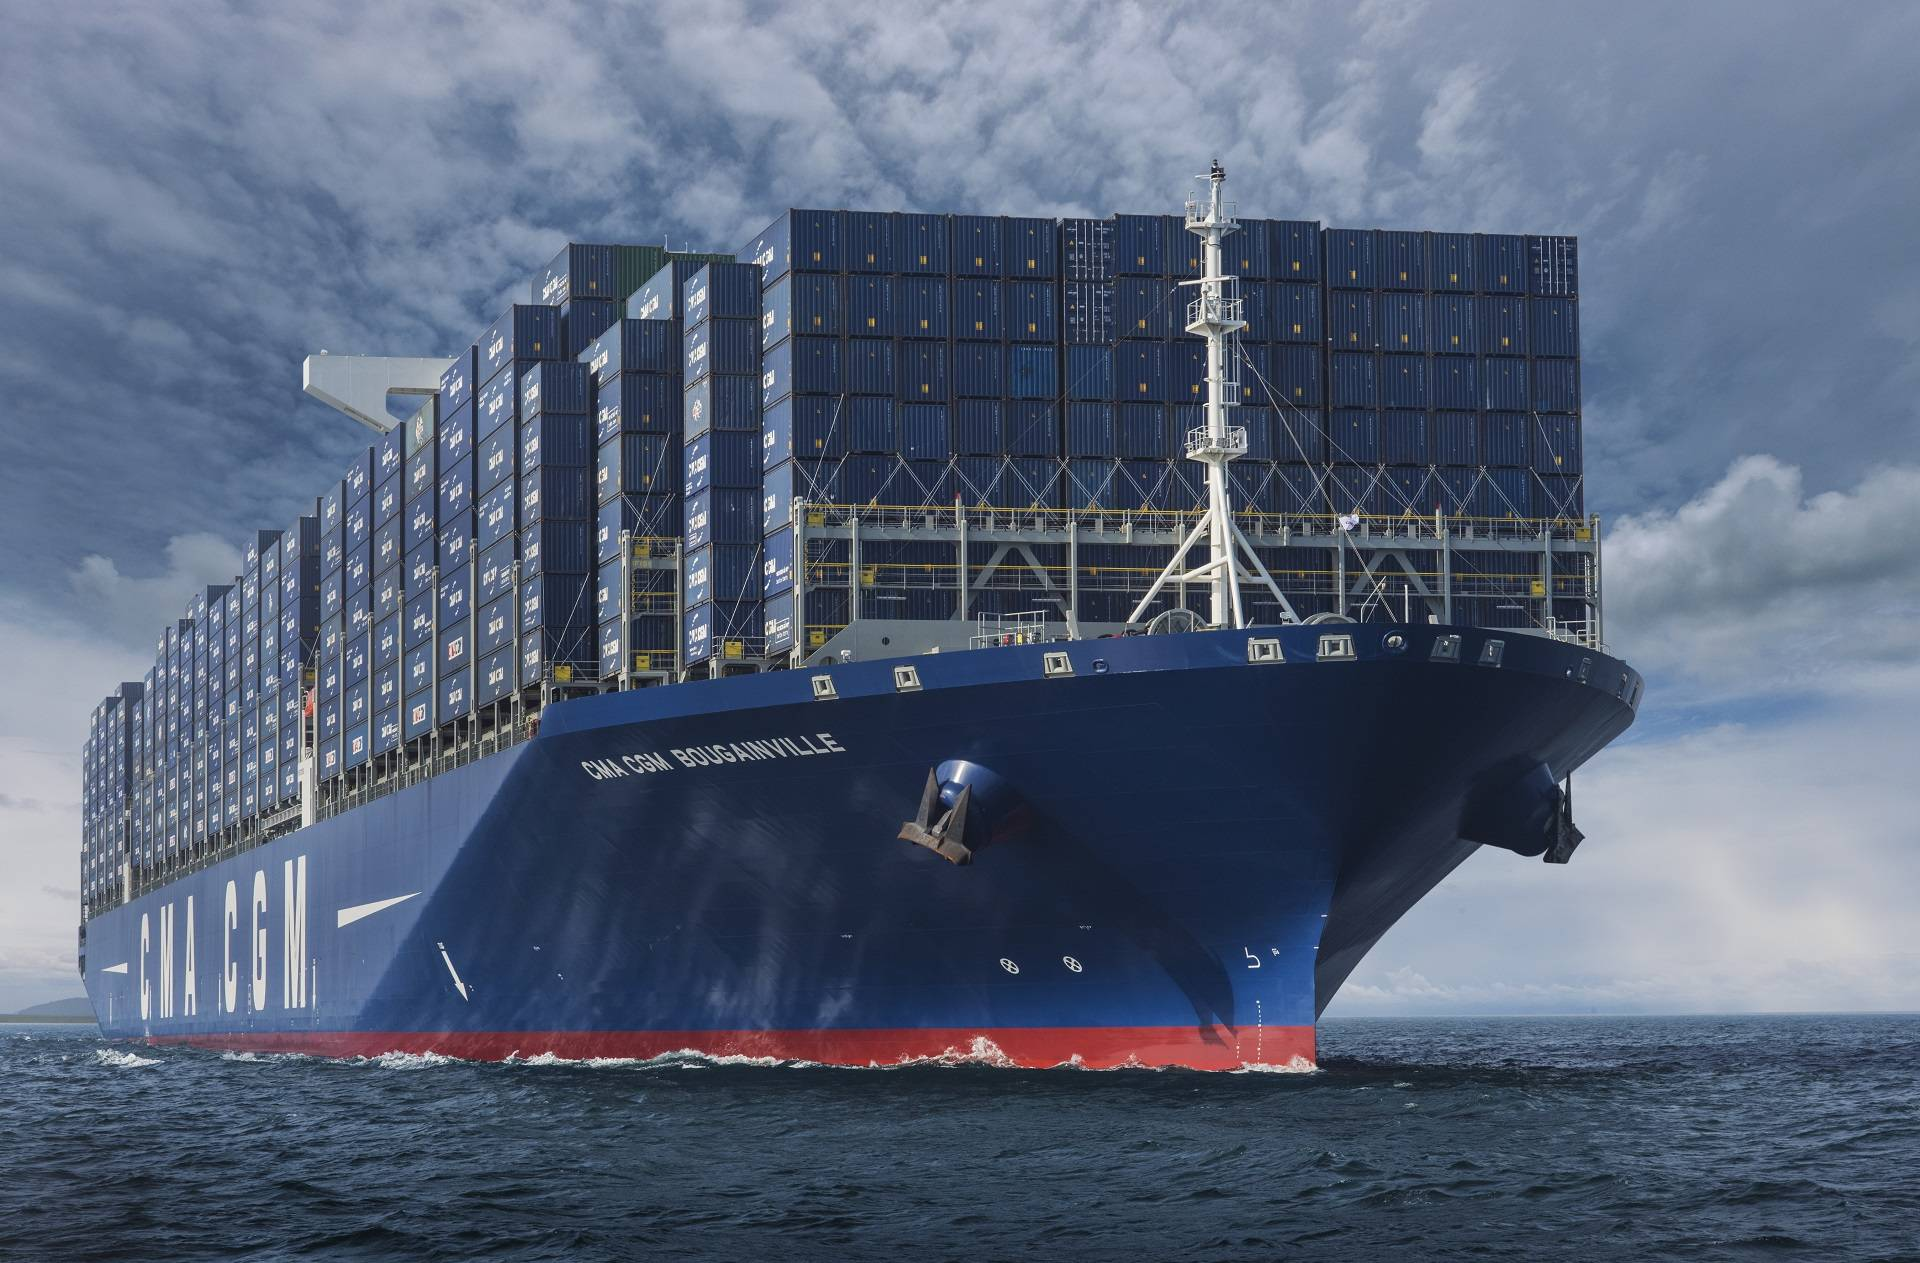 CMA CGM: Ο γαλλικός κολοσσός των κοντέινερ βάζει πλαφόν στα ναύλα